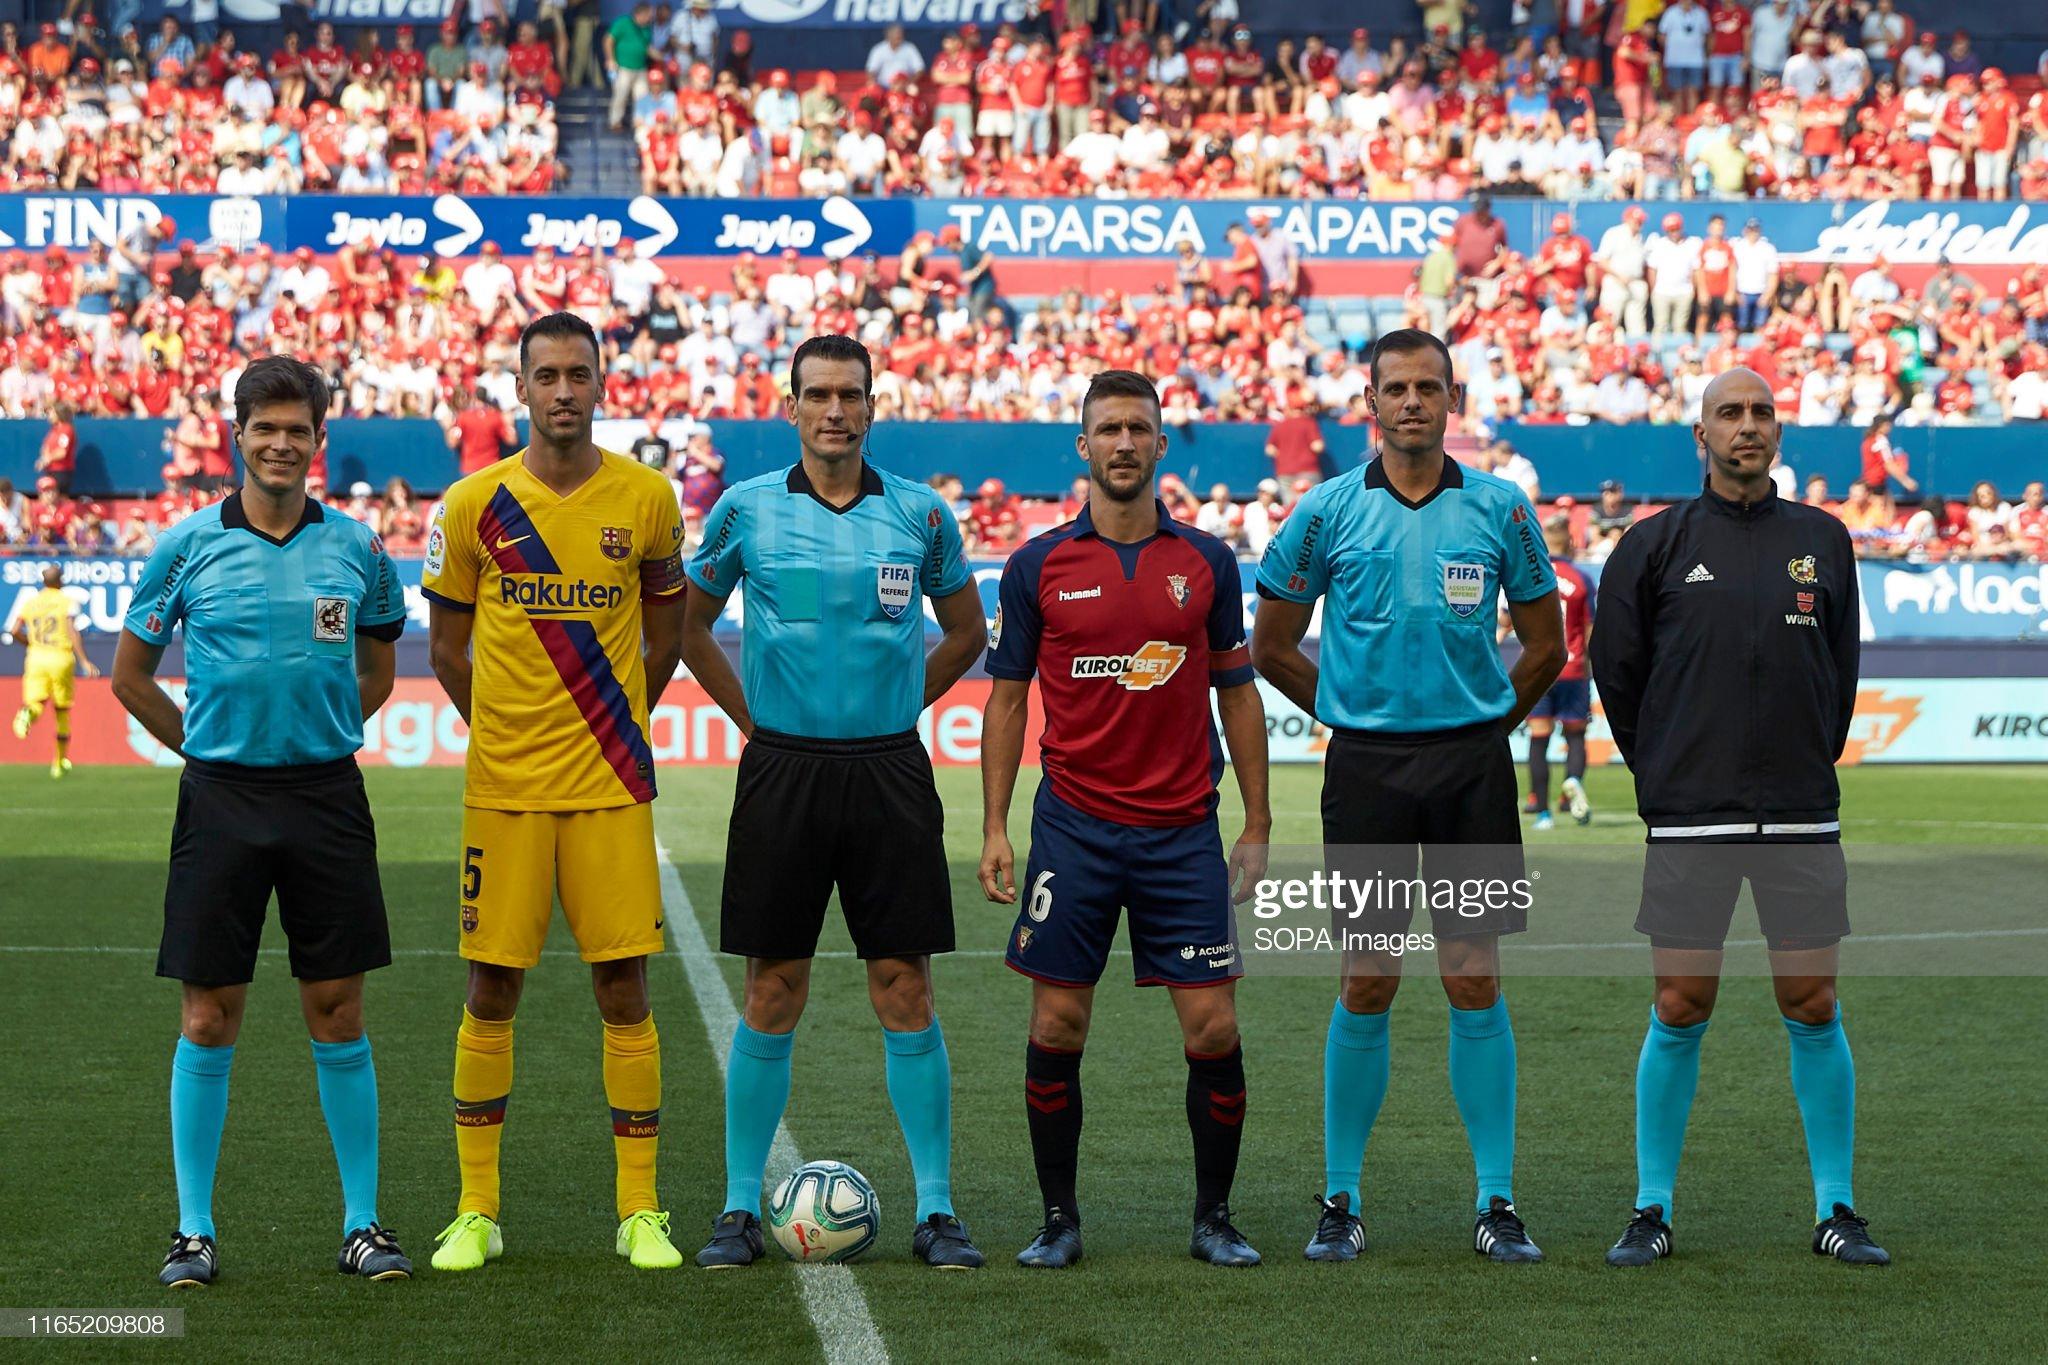 صور مباراة : أوساسونا - برشلونة 2-2 ( 31-08-2019 )  Captains-of-both-teams-and-the-referees-during-the-spanish-la-liga-picture-id1165209808?s=2048x2048